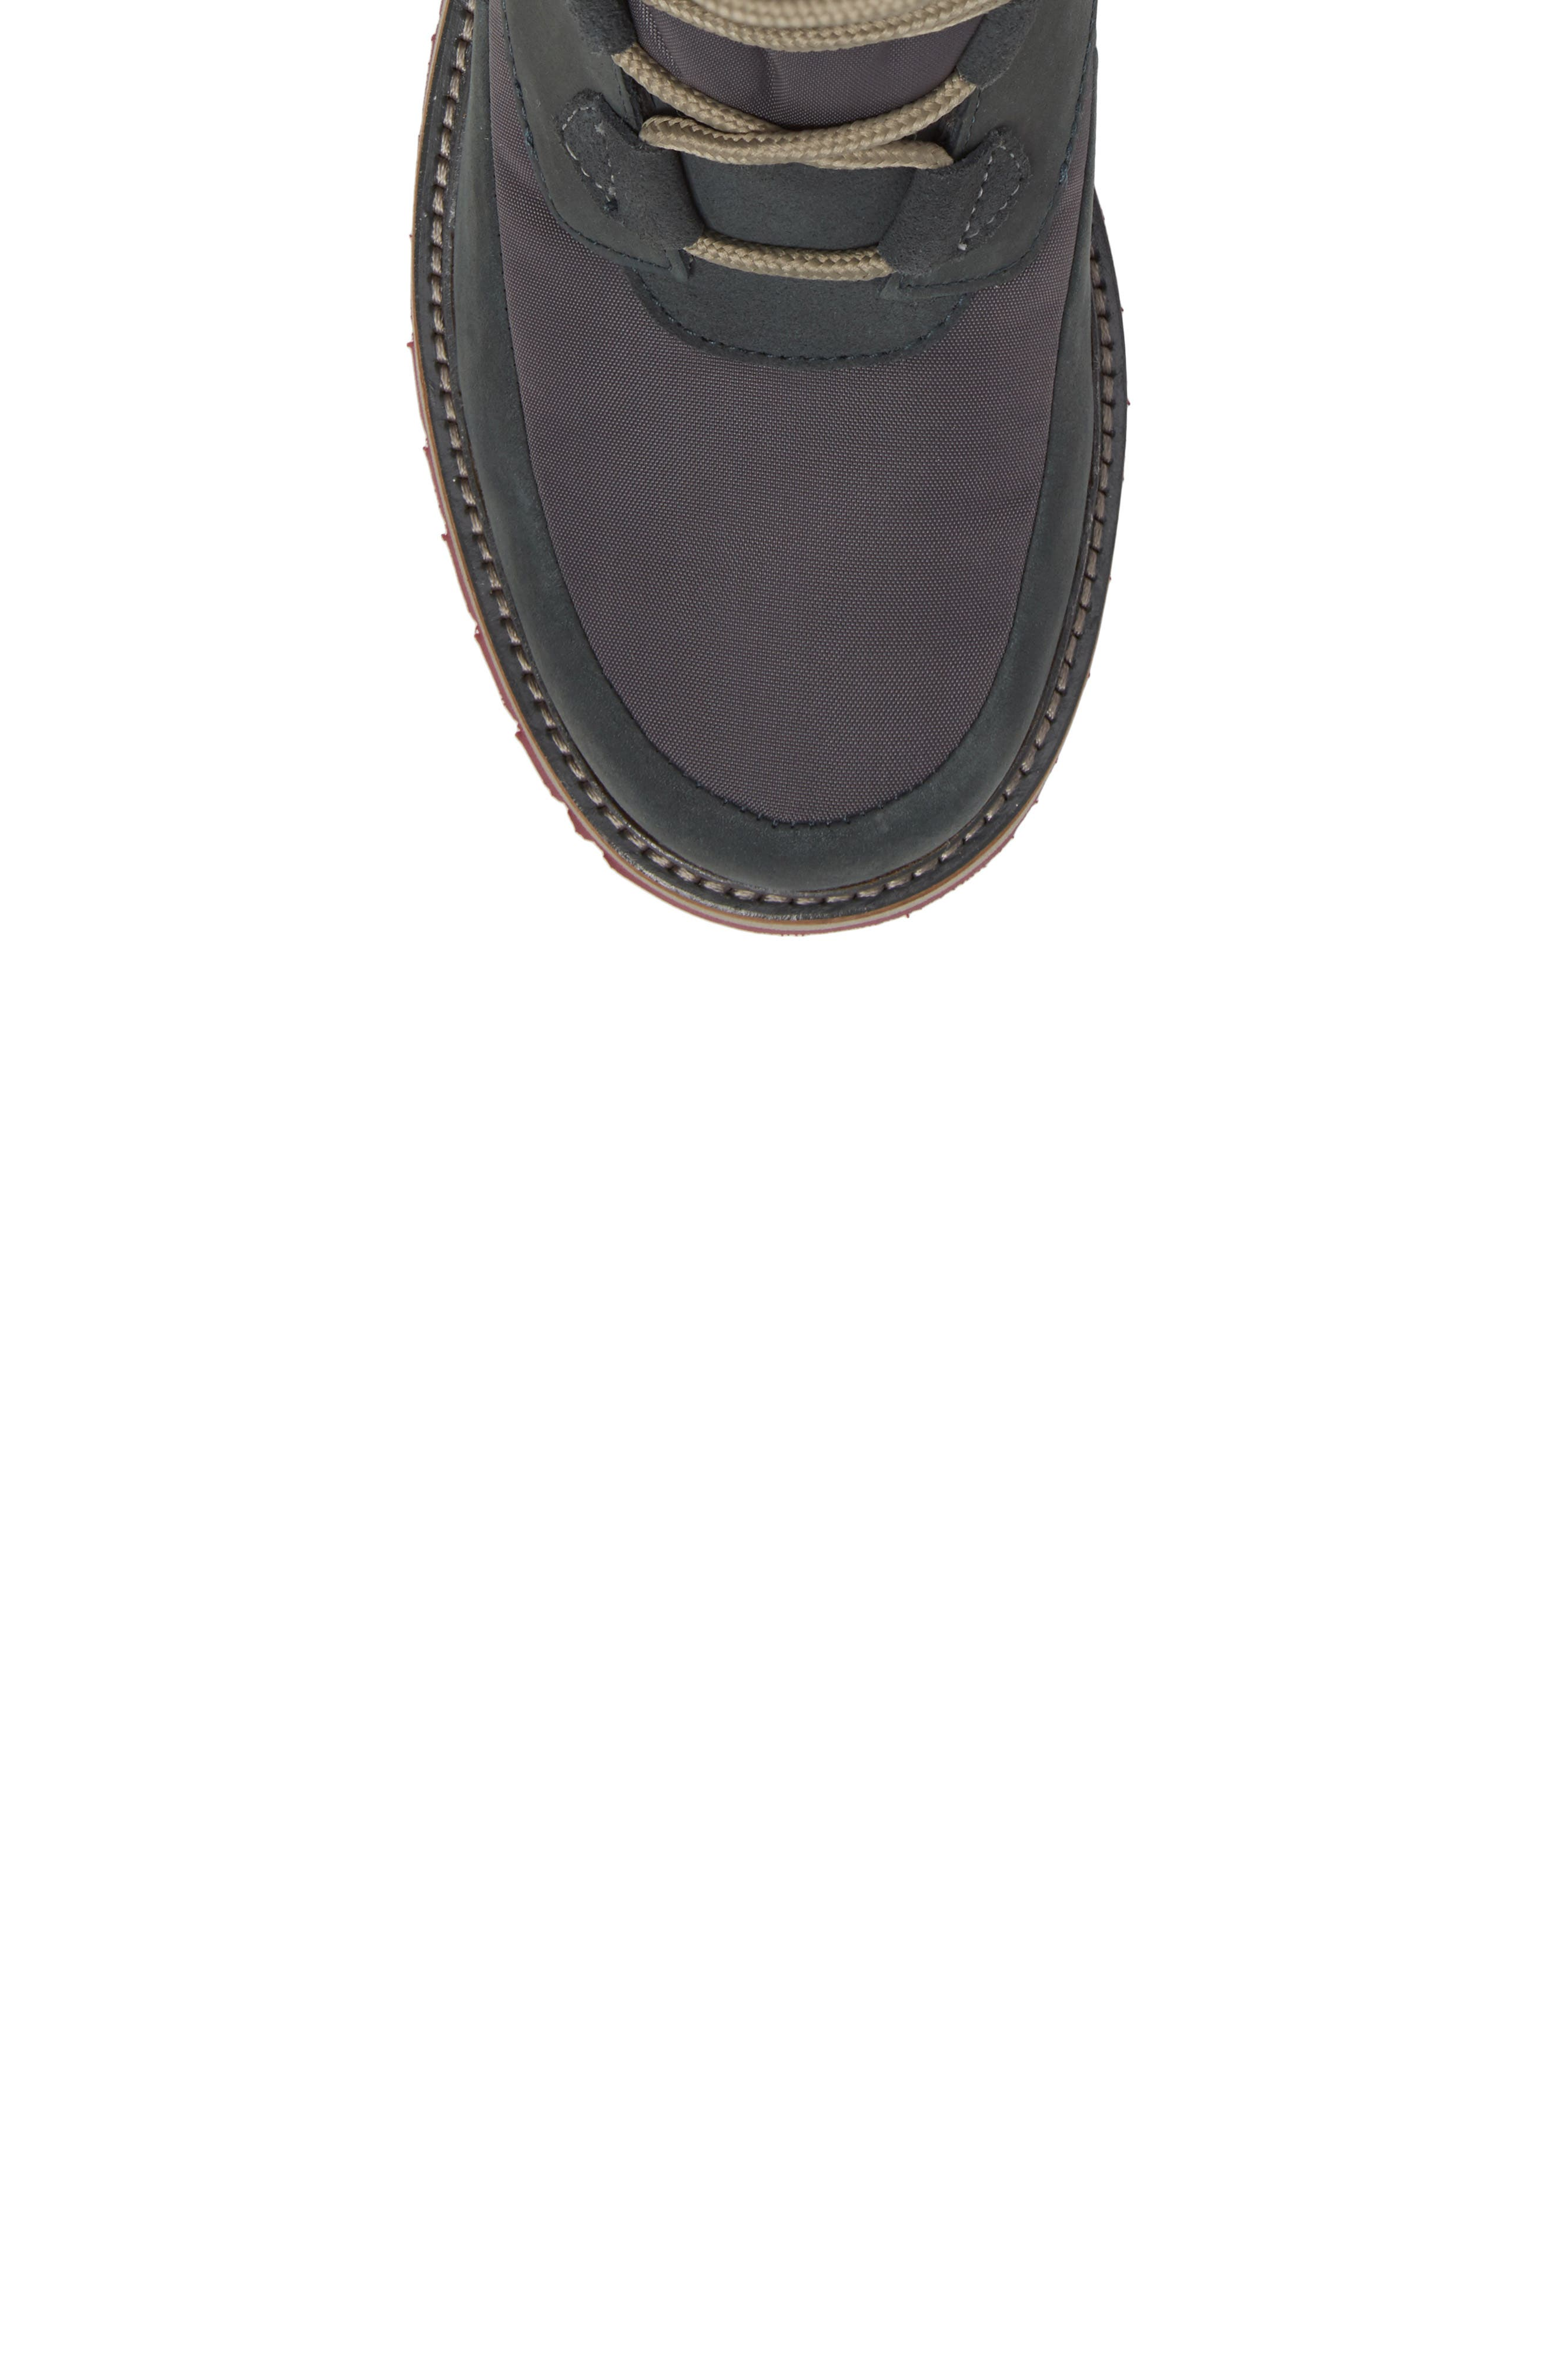 Arosa Waterproof Boot with Faux Fur Trim,                             Alternate thumbnail 5, color,                             Darkest Spruce / Rock / La